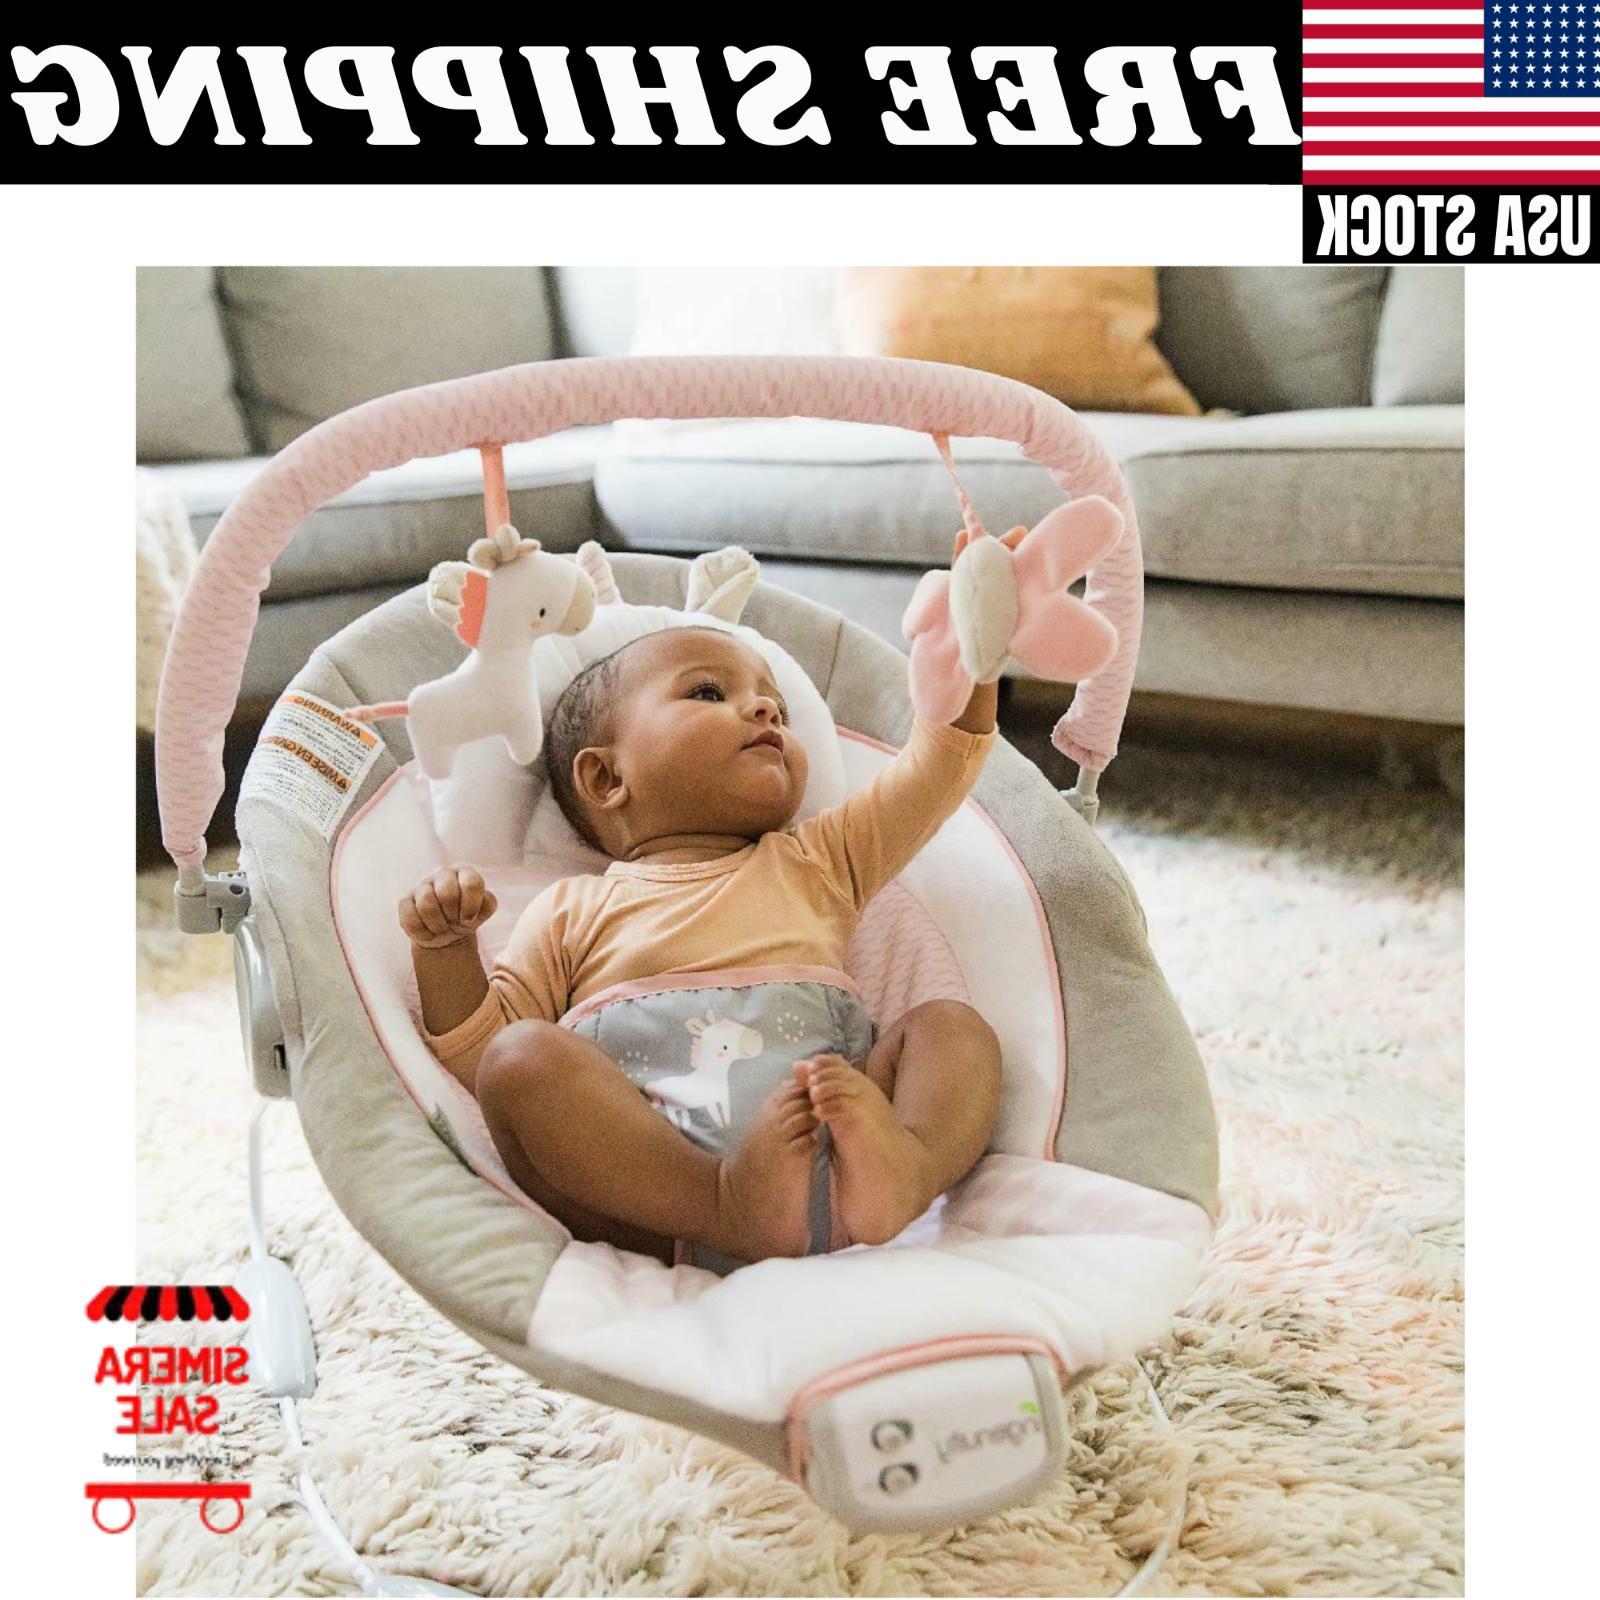 Cradling - - Ultra-Plush Infant Vibration Chair